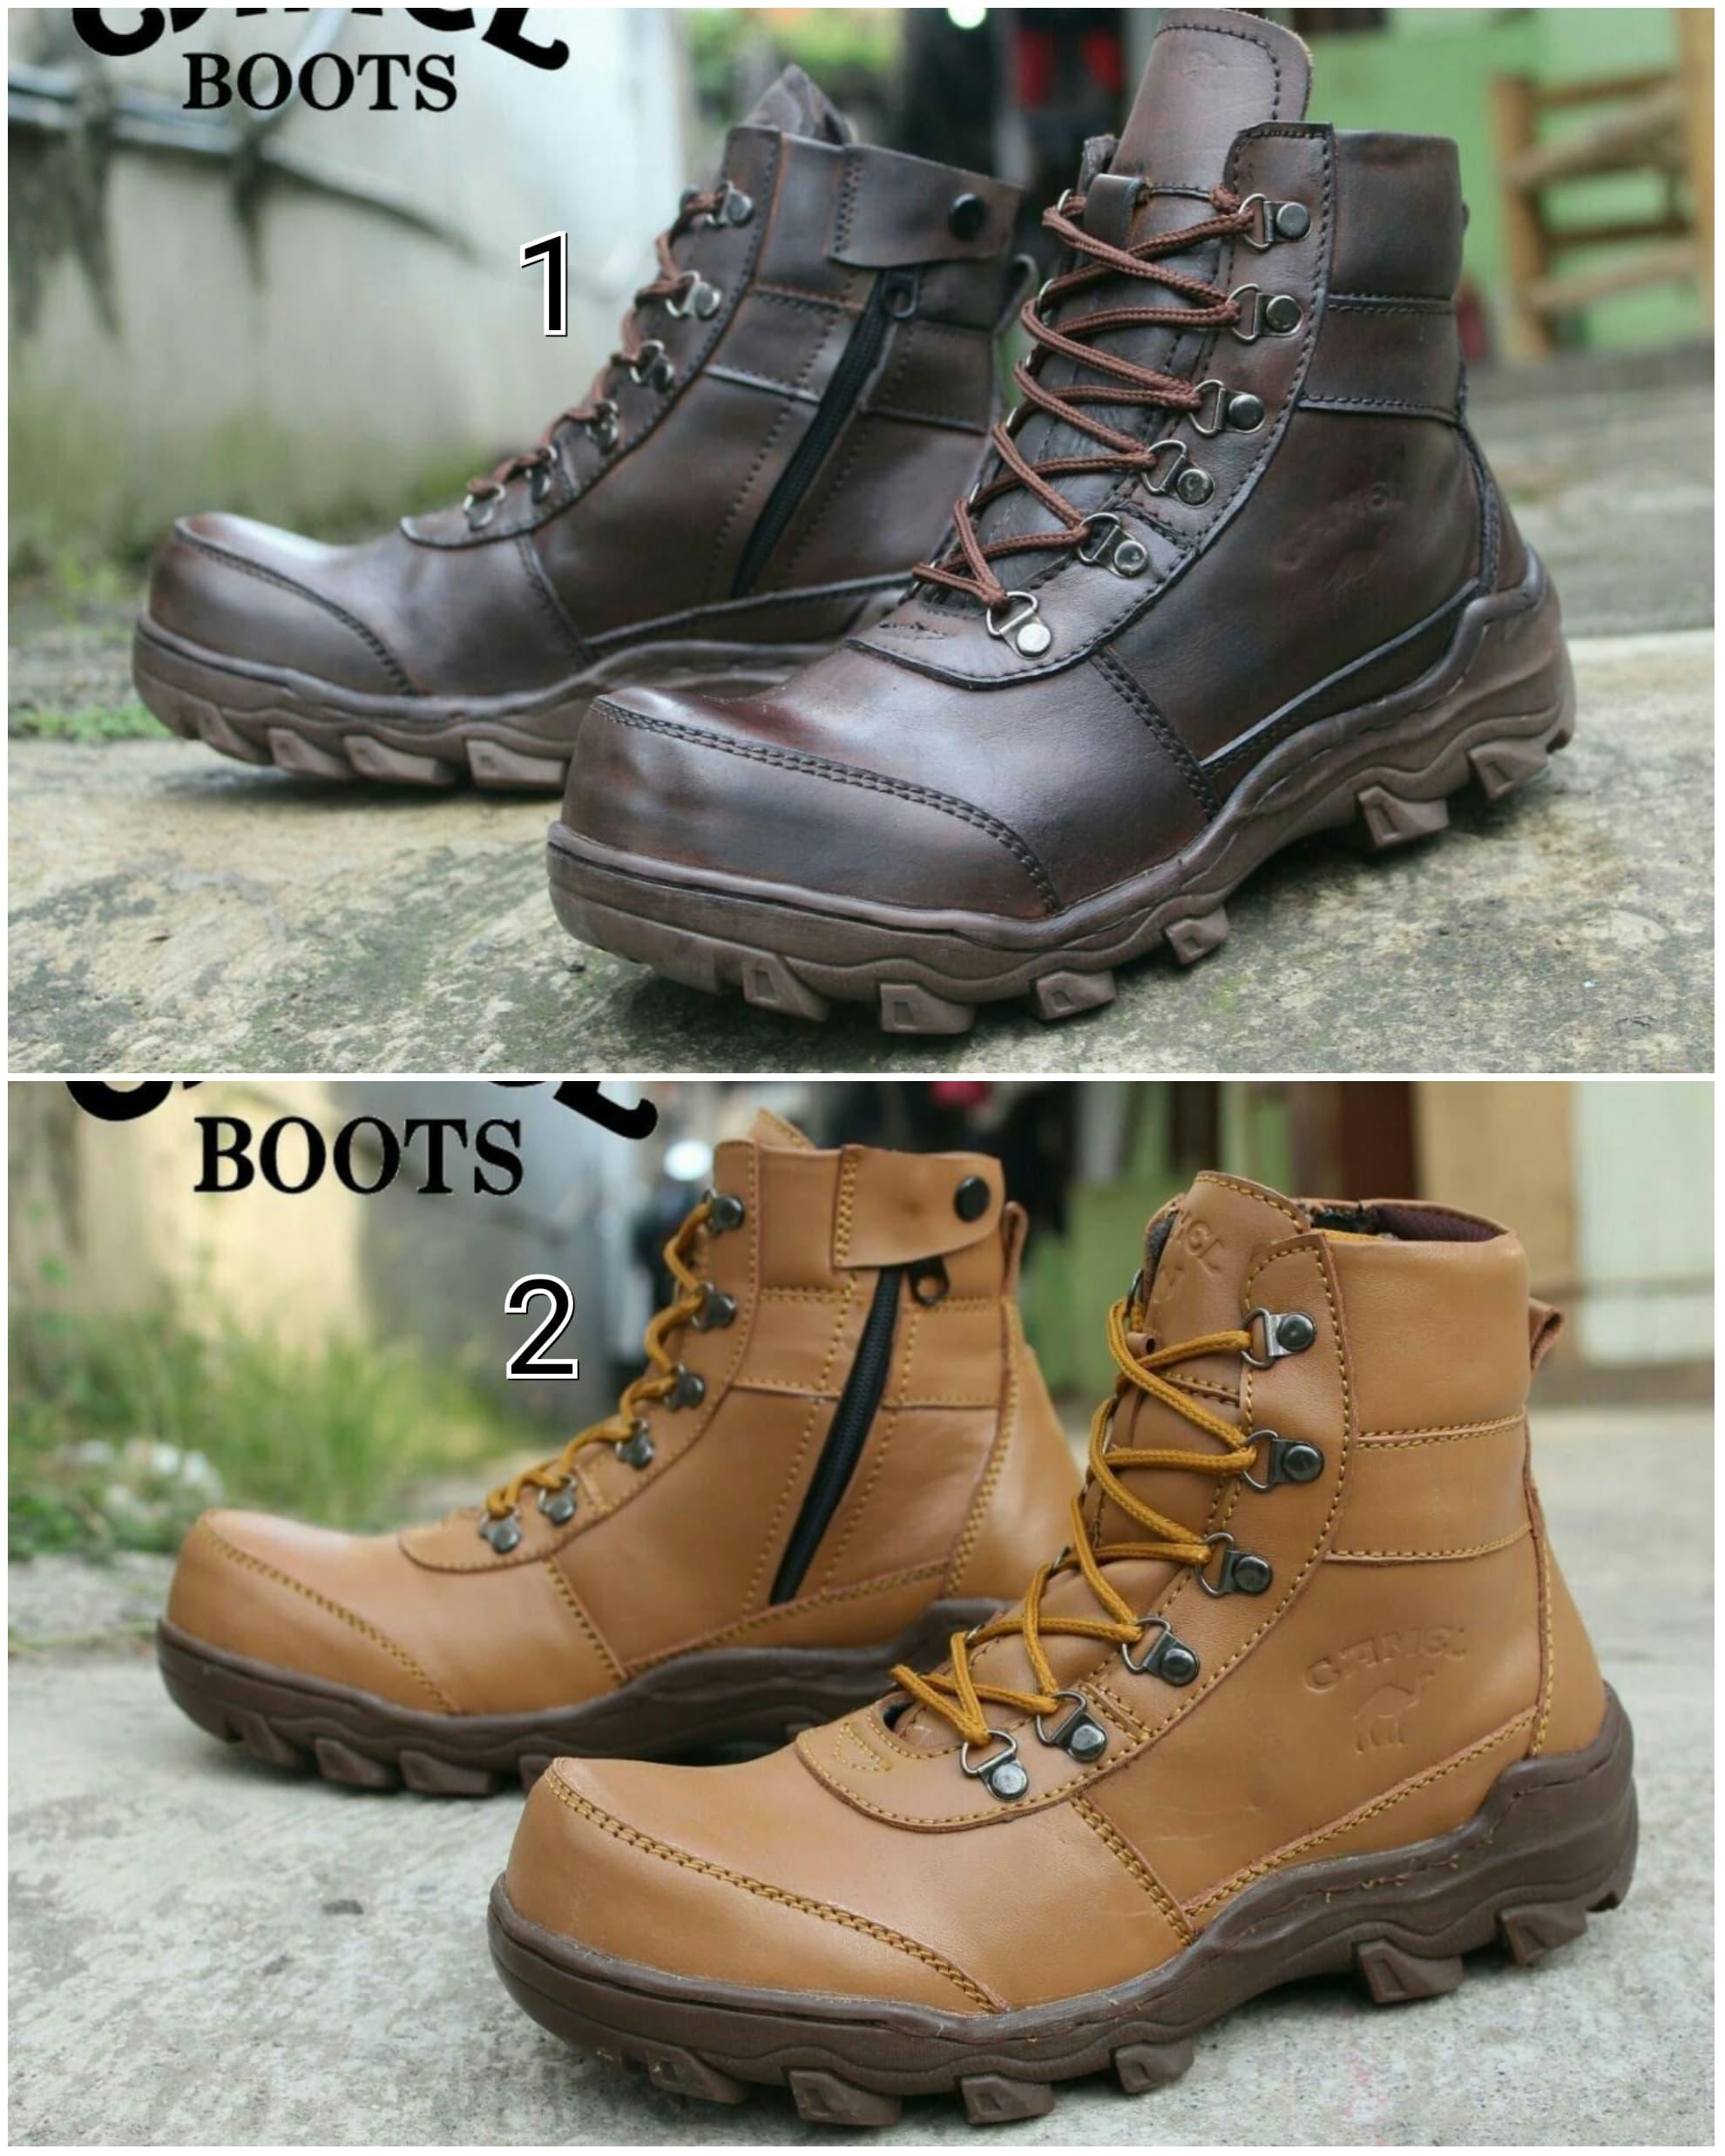 DISKON Sepatu Boots Pria Camel Mountain Safety Kulit Asli Ujung Besi 6838d9b5ca